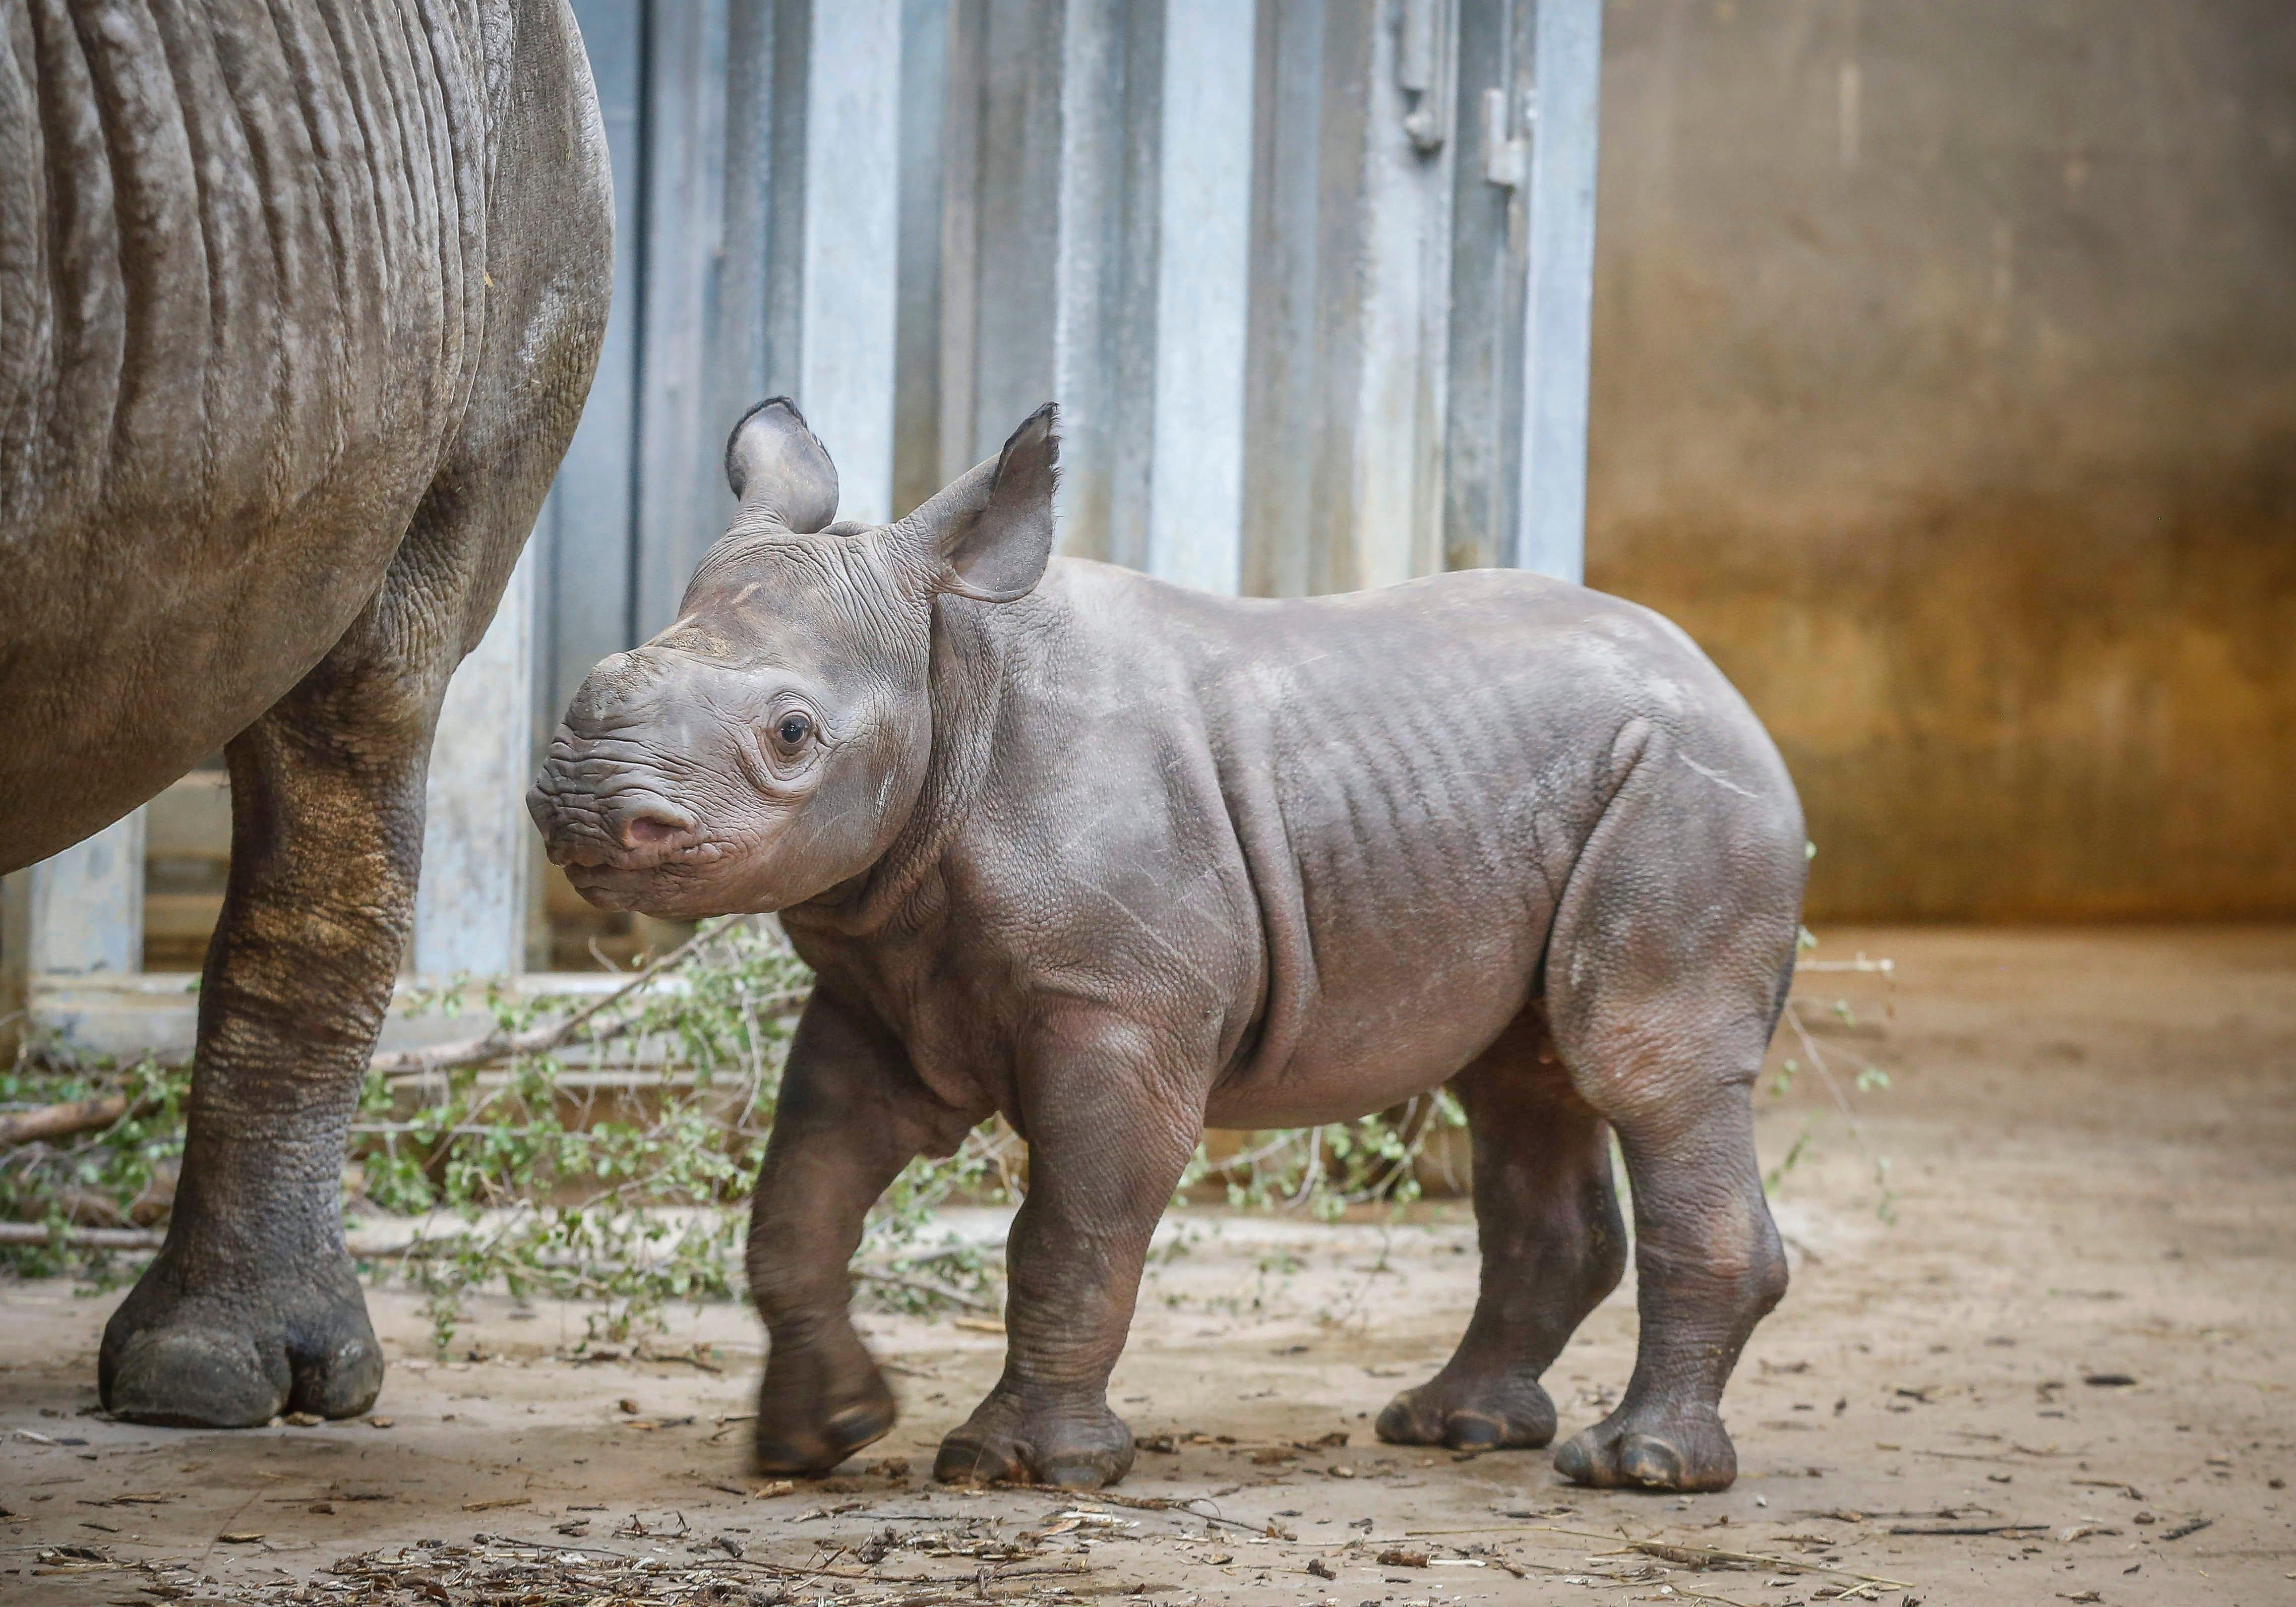 Baby rhino Kamara meets the public